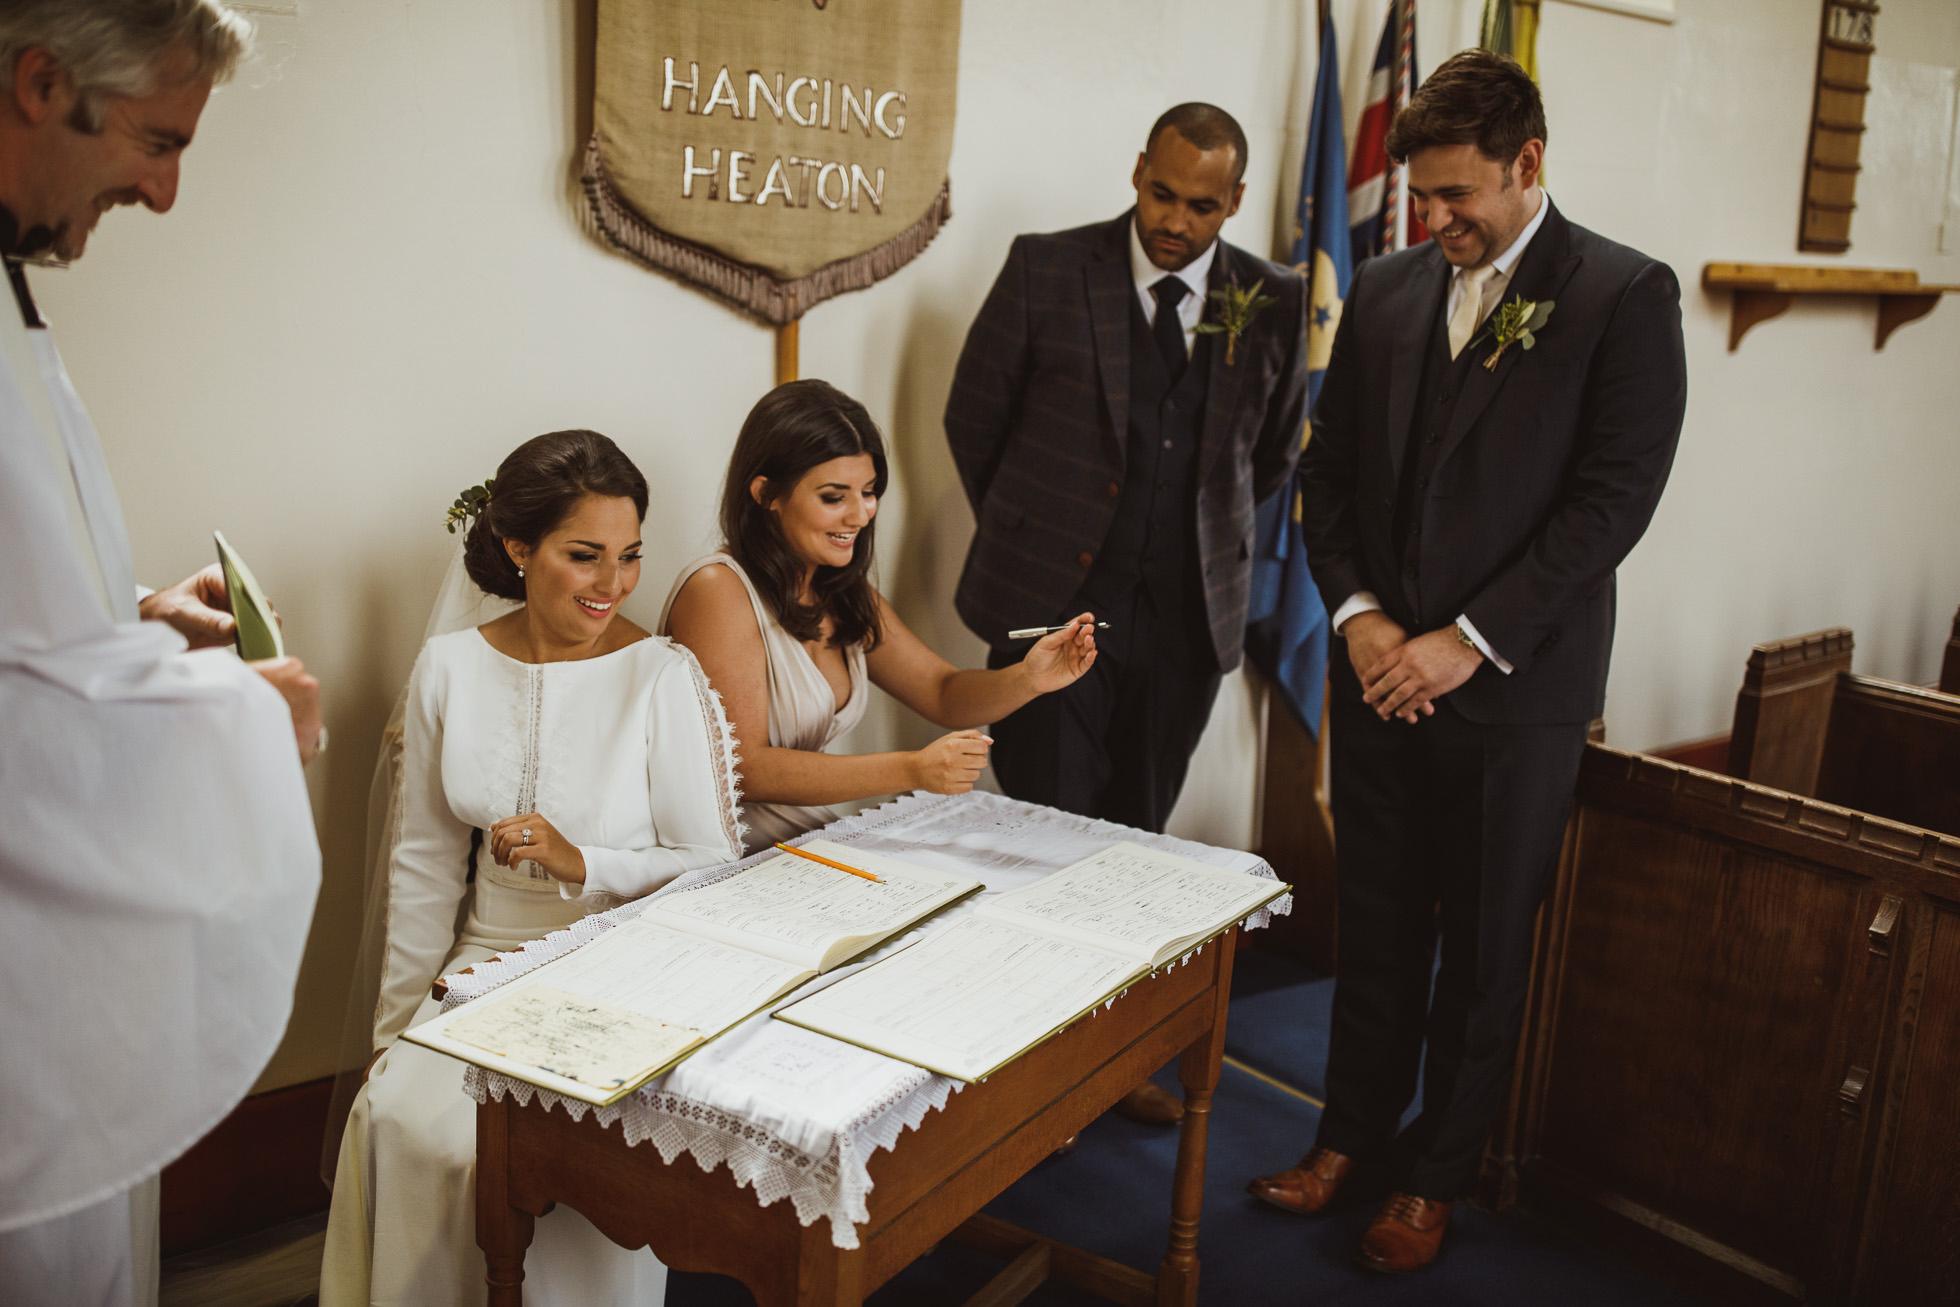 woodman_inn_thunderbridge_wedding_photographer-56.jpg